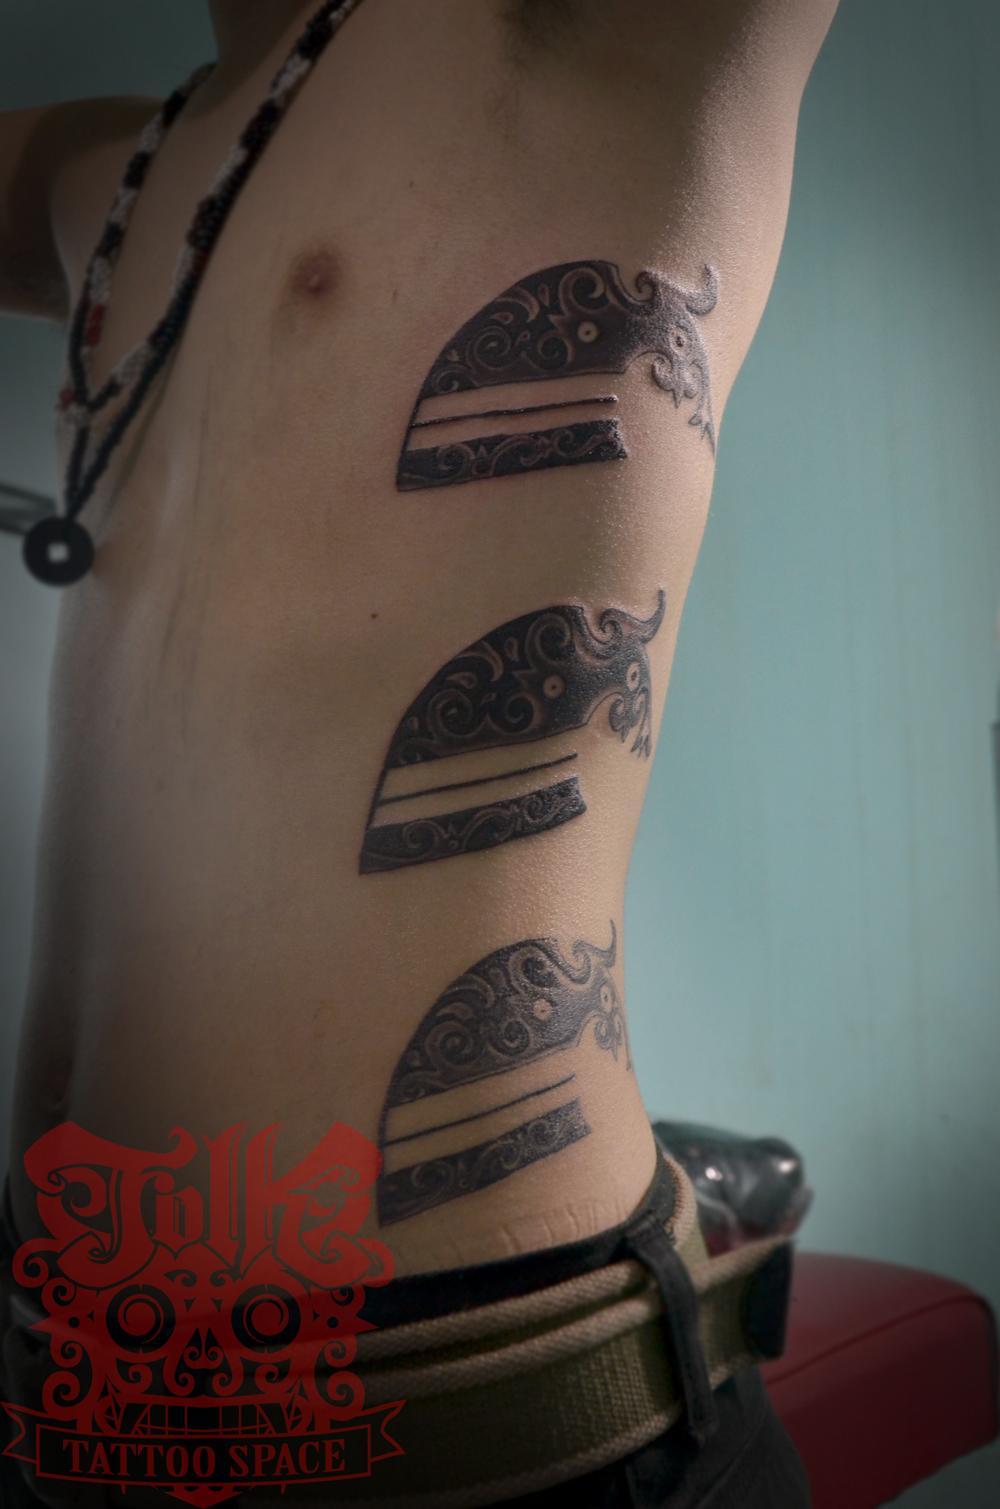 ganz arm tattoo vorlagen tattoos arm komplett awesome arm. Black Bedroom Furniture Sets. Home Design Ideas